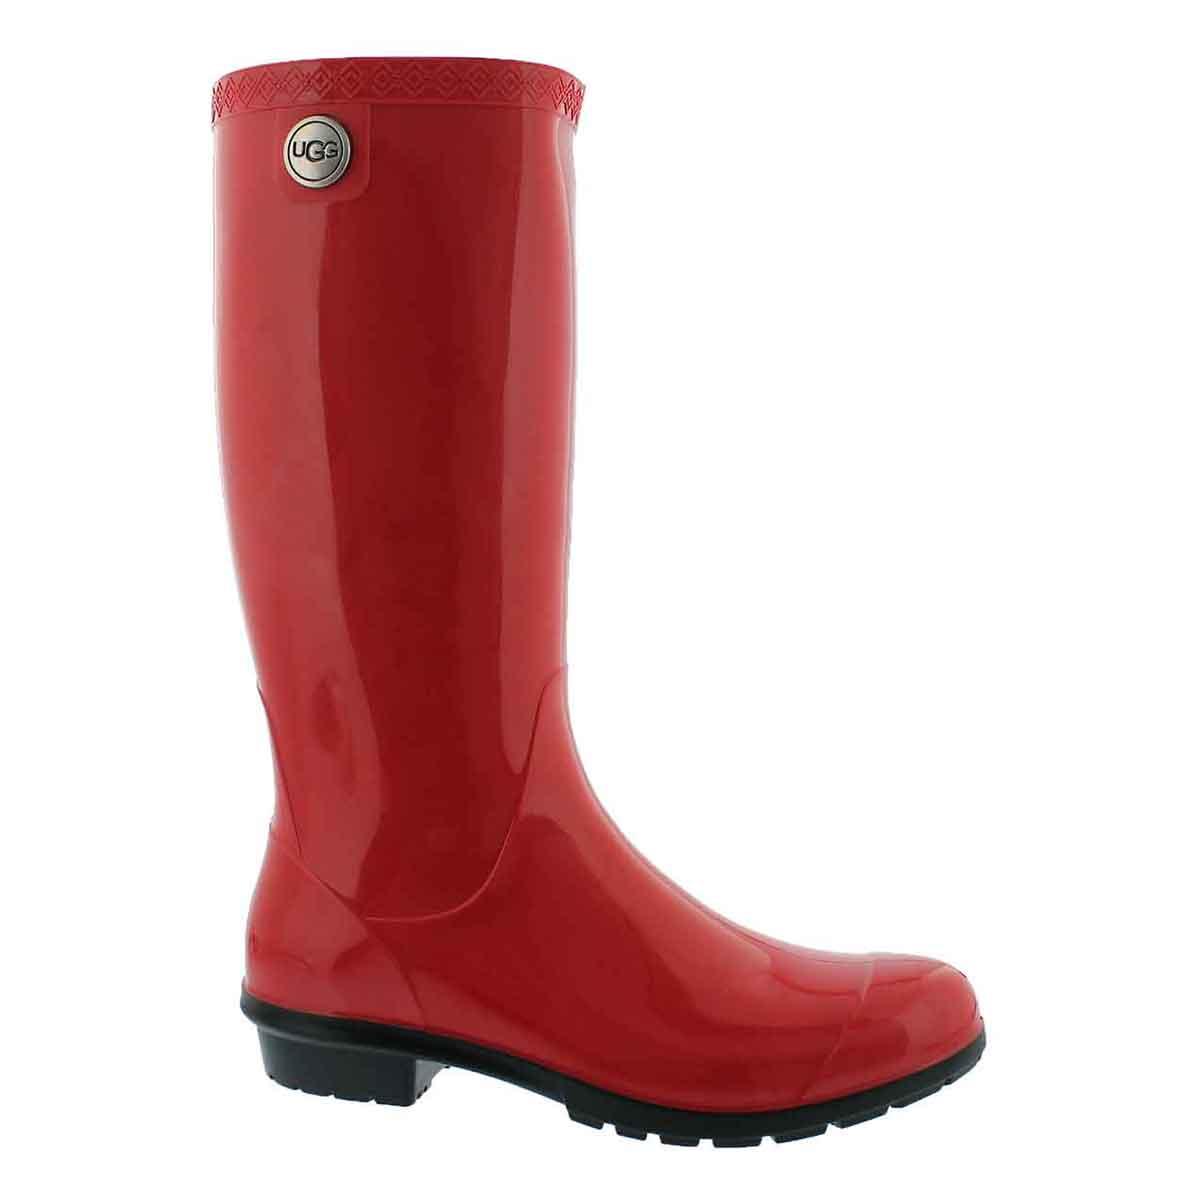 Women's SHAYE tango red waterproof rain boots